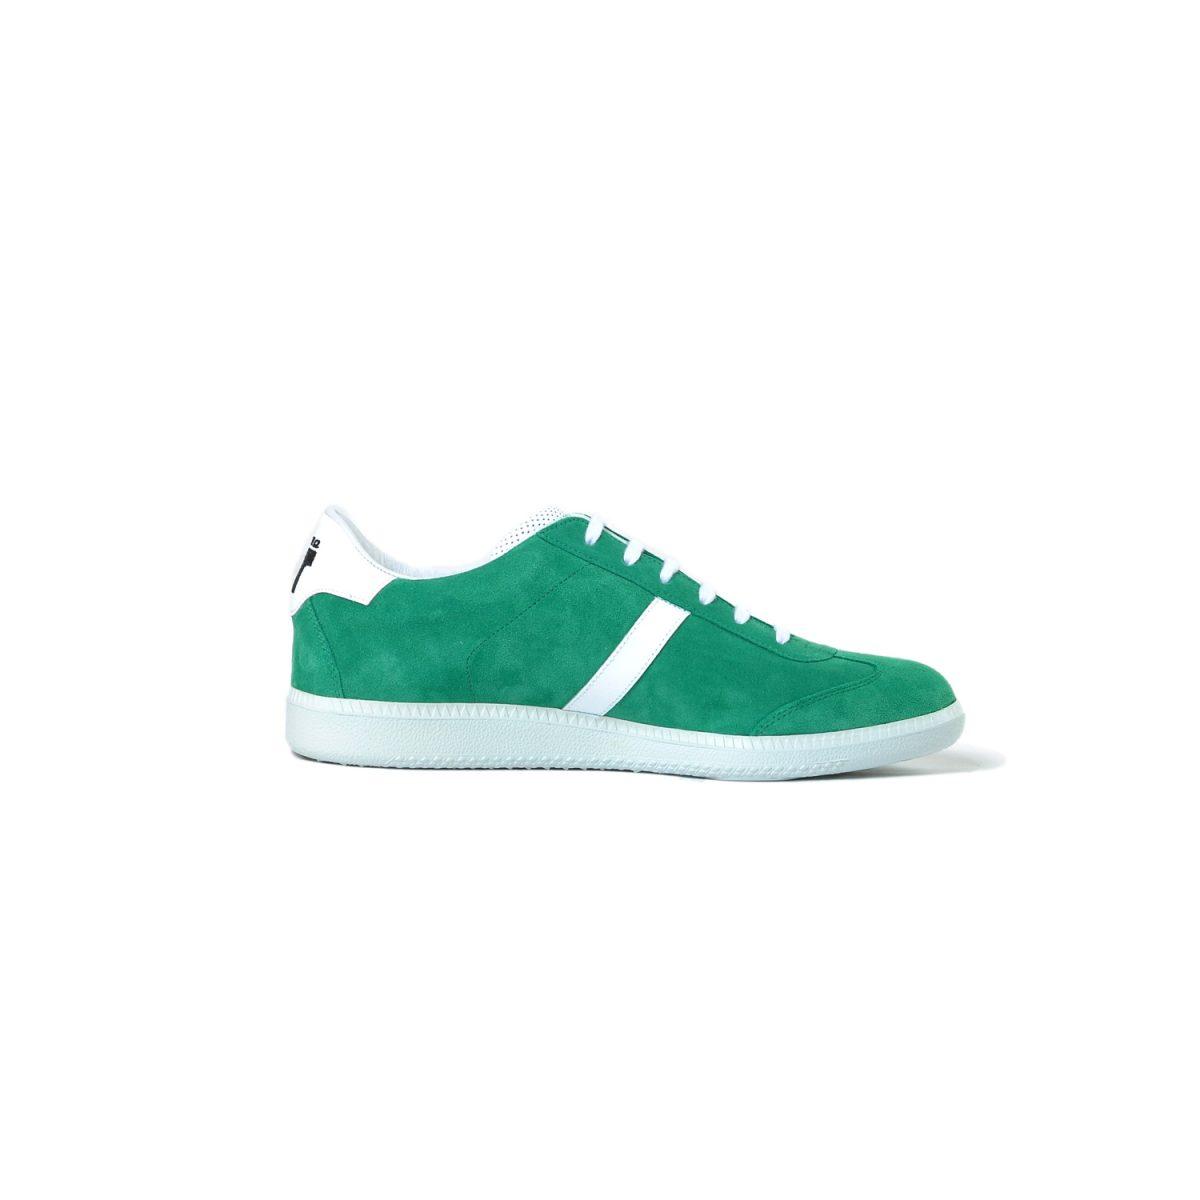 Tisza shoes - Comfort - Green-white